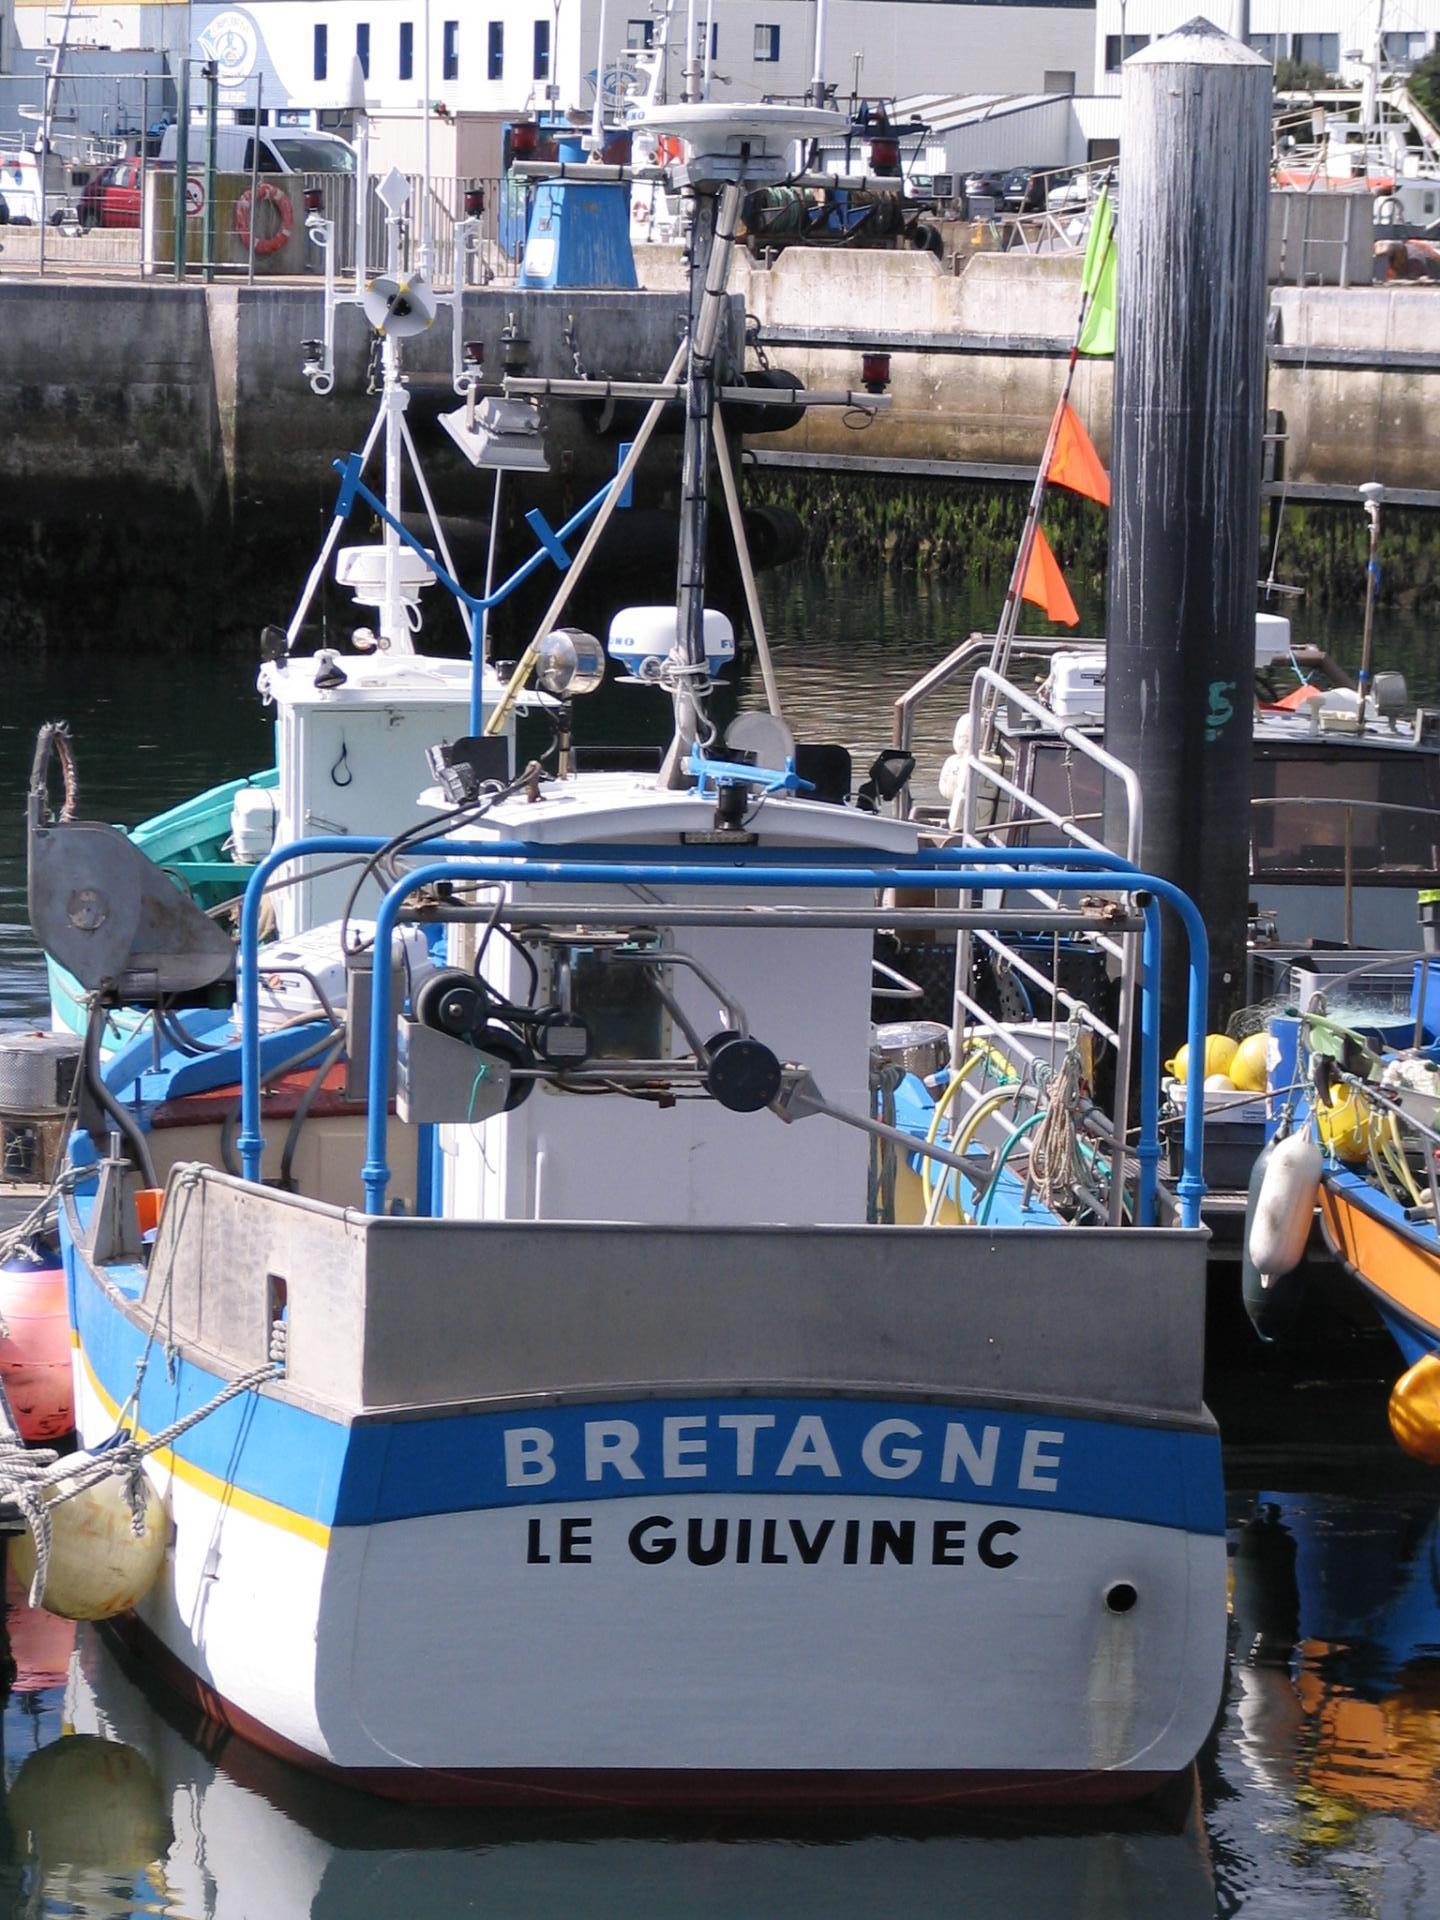 Bretagne gv